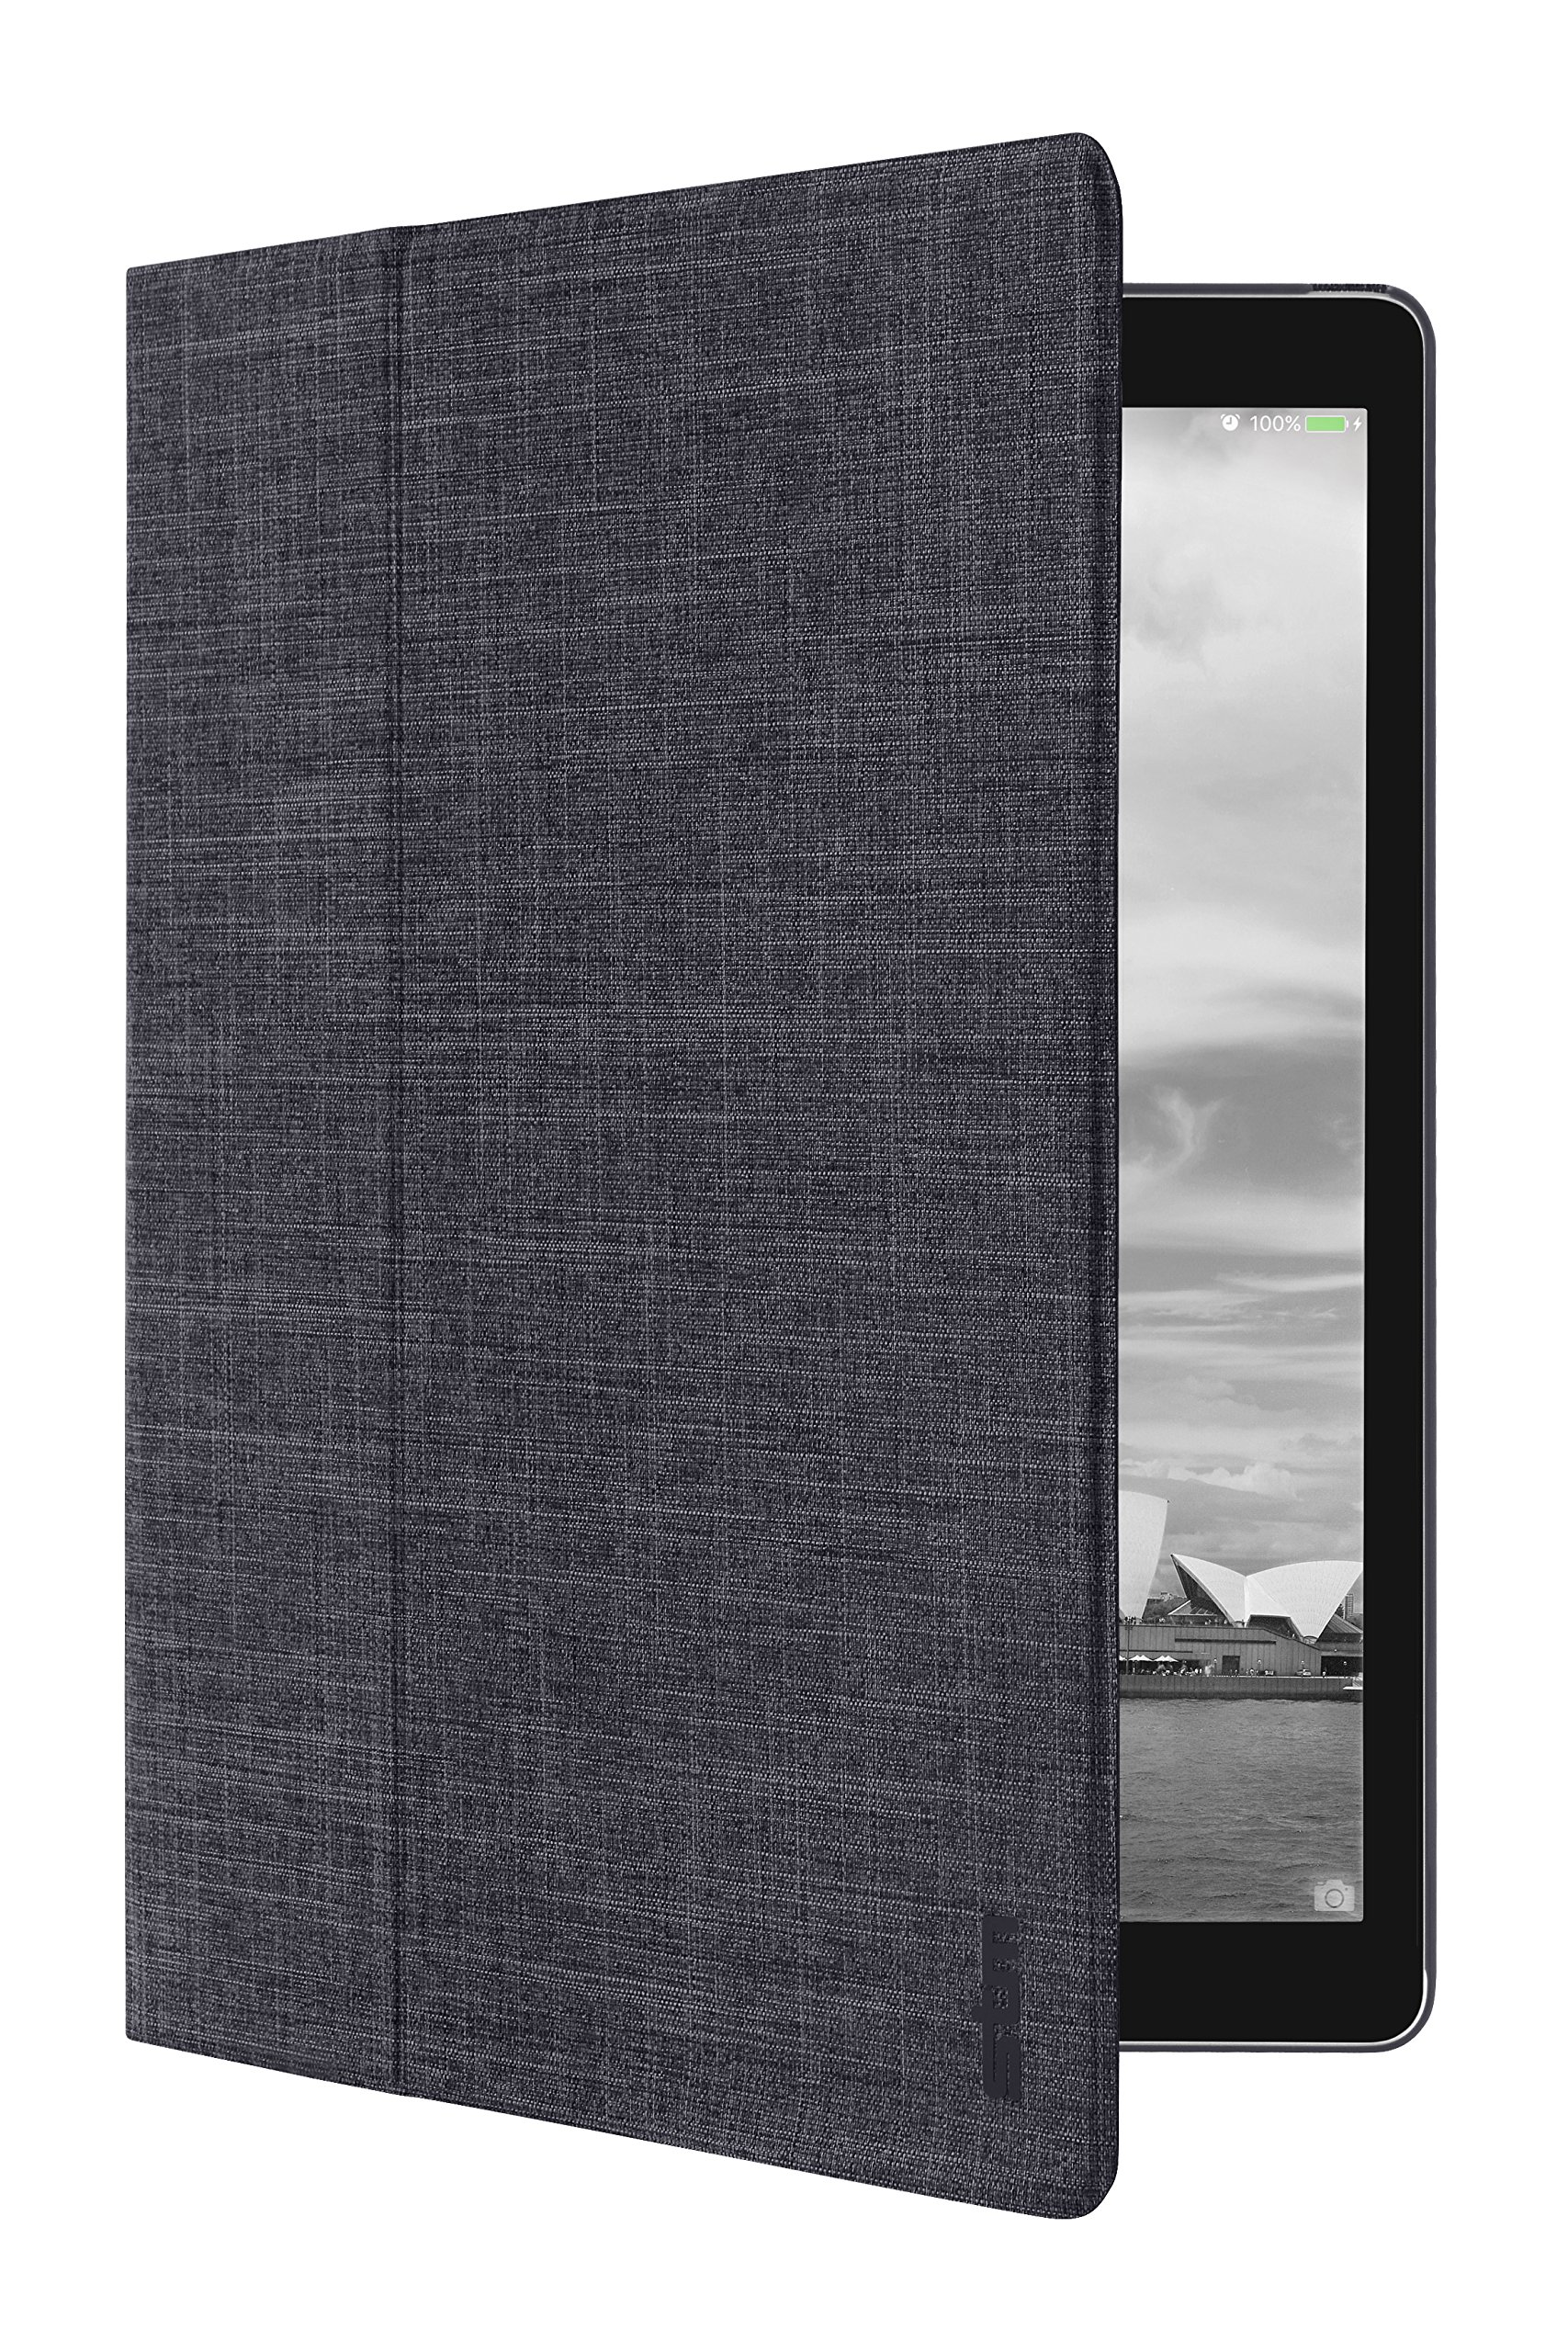 STM Atlas Slim Folio Case for Apple iPad Pro 12.9, 2015 1st Generation Case - Charcoal (stm-222-109L-16)